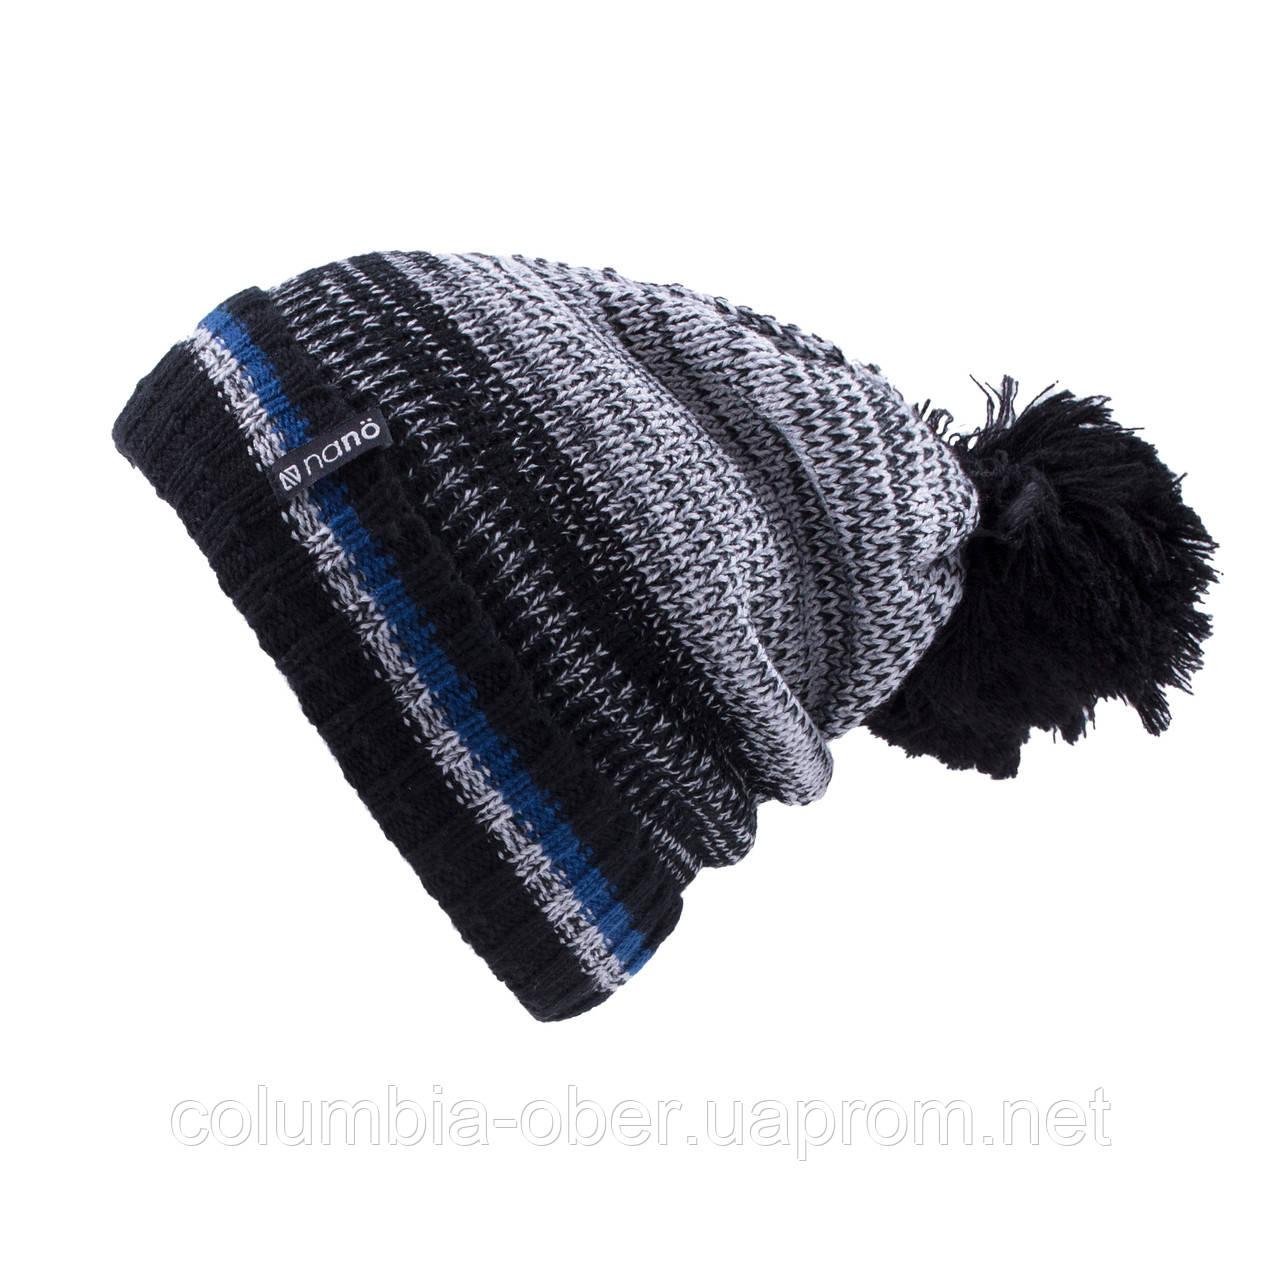 Зимняя шапка для мальчика Nano F19TU265 Black/DustGray. Размер 7/12.